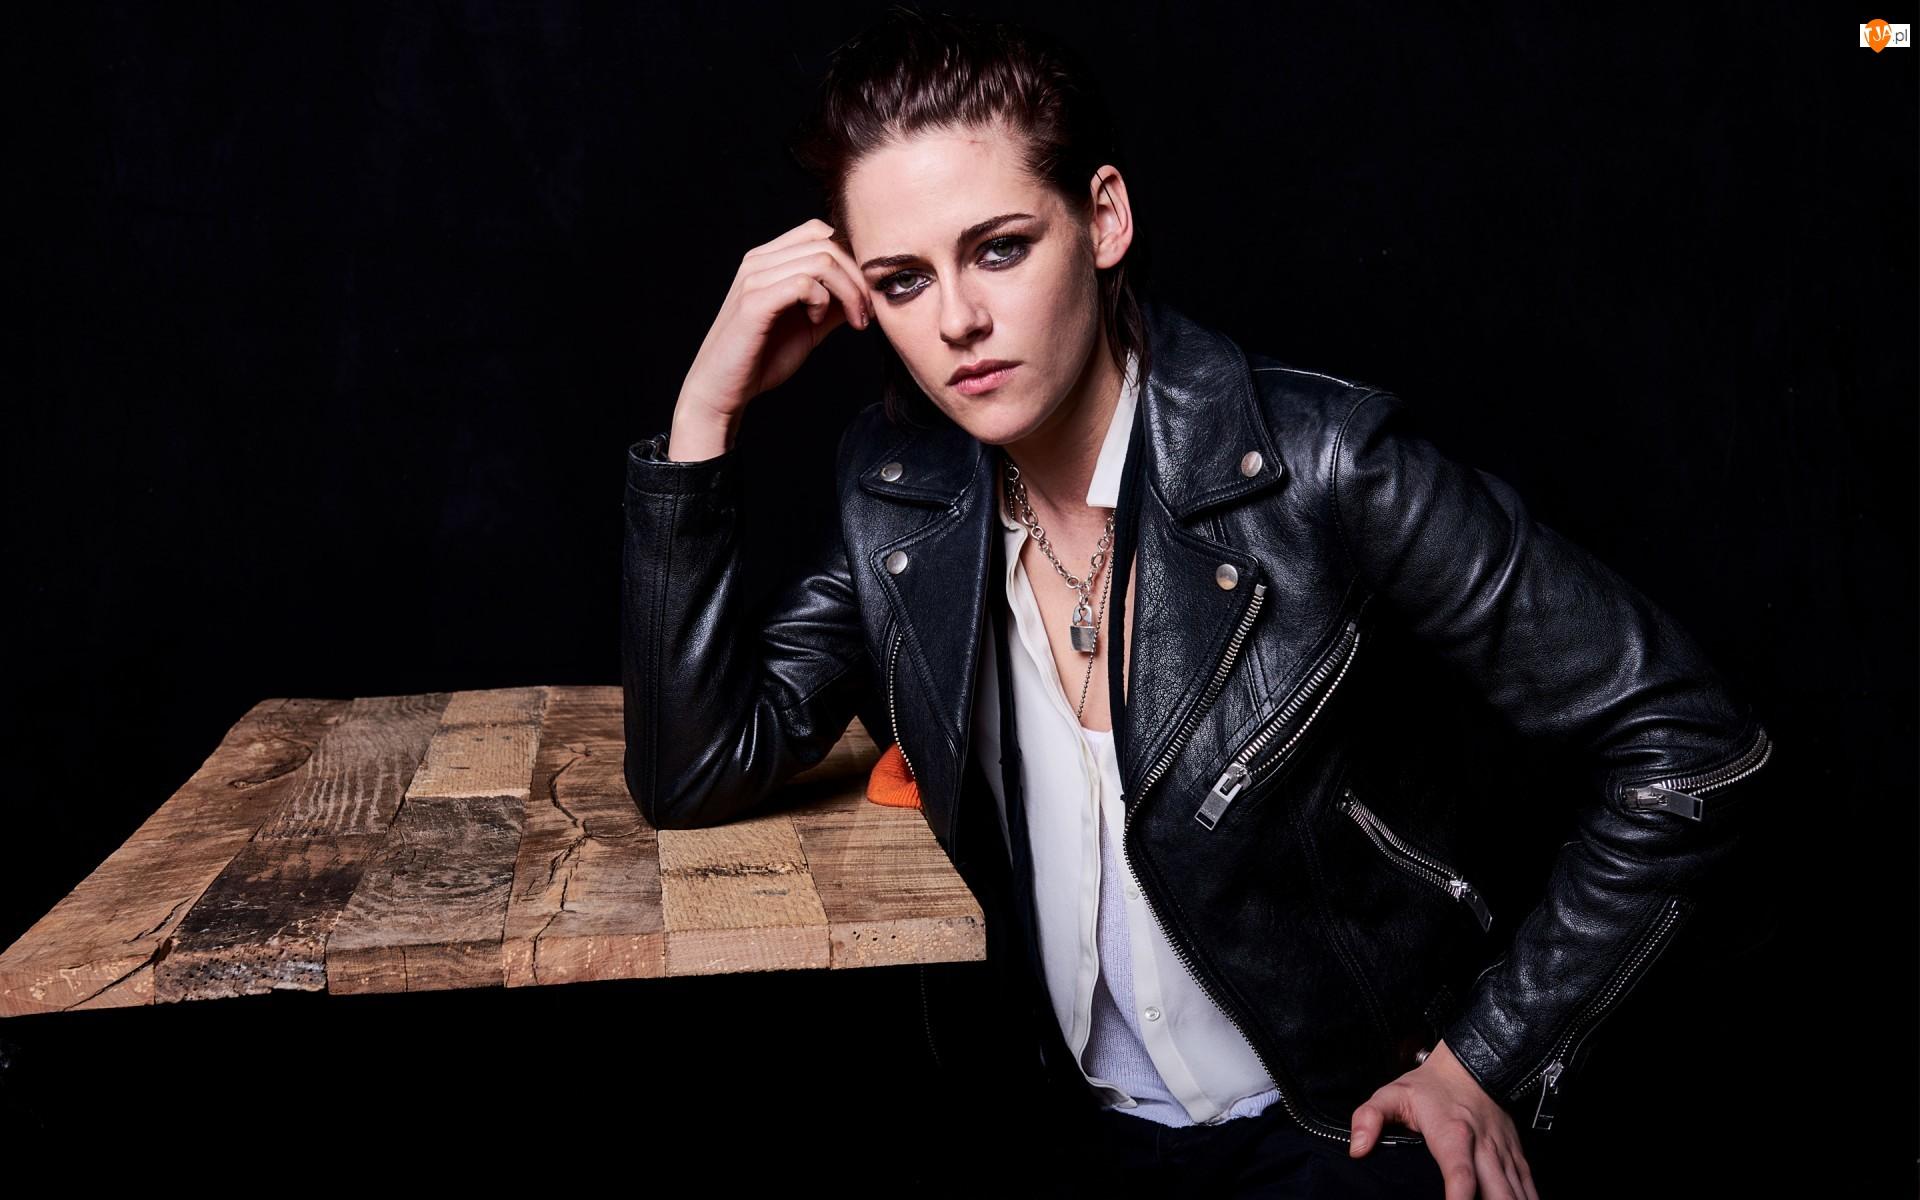 Kristen Stewart, Spojrzenie